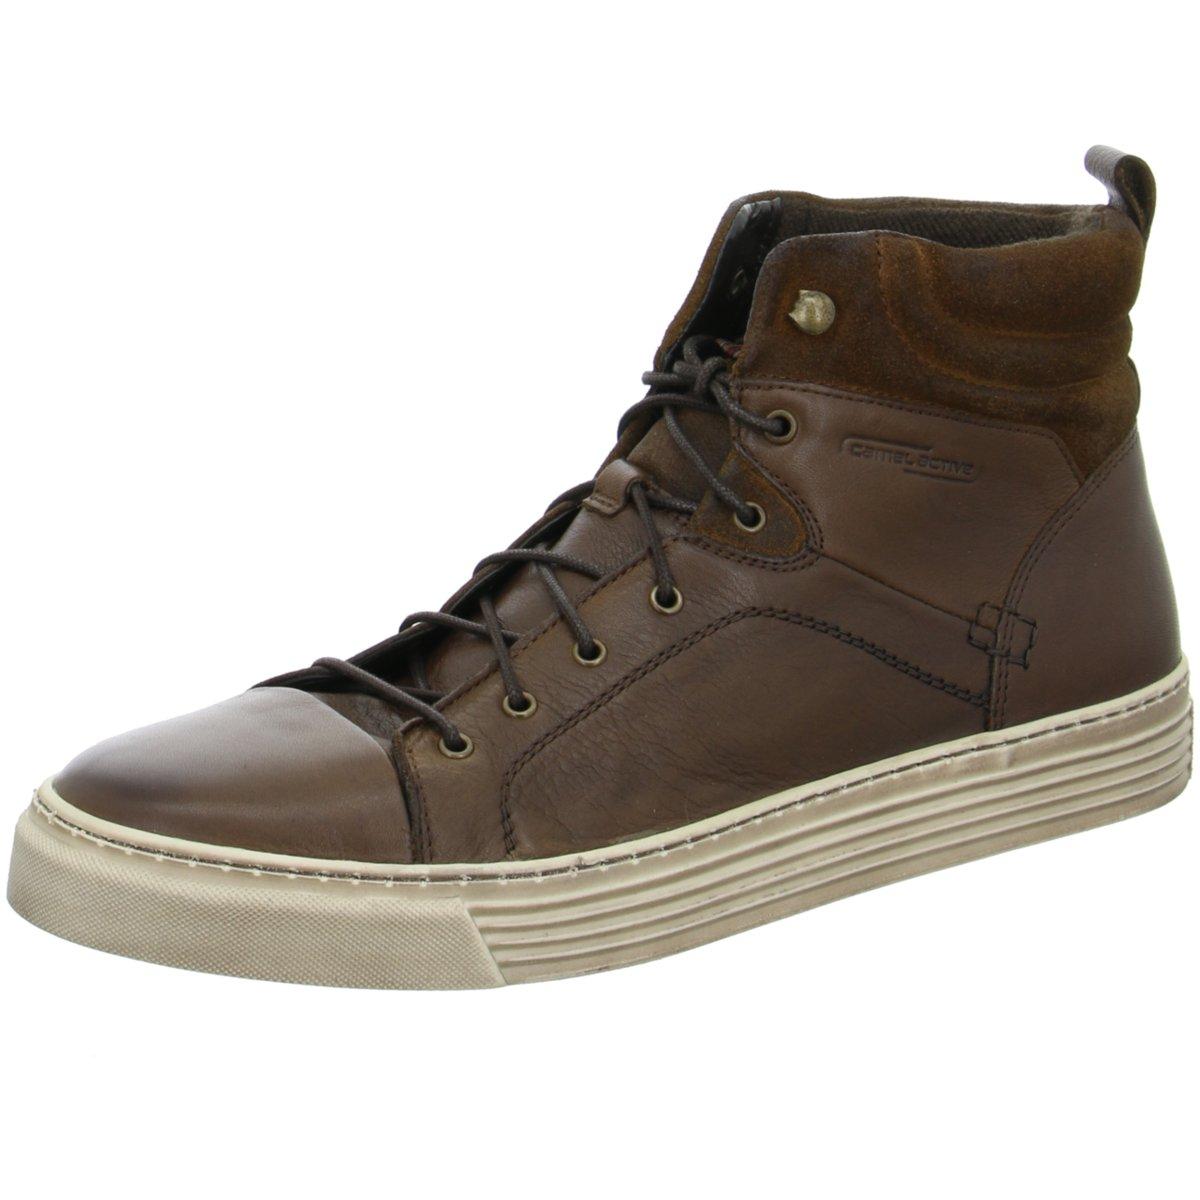 Details zu camel active Herren Sneaker 429.12 01 bowl braun 100745